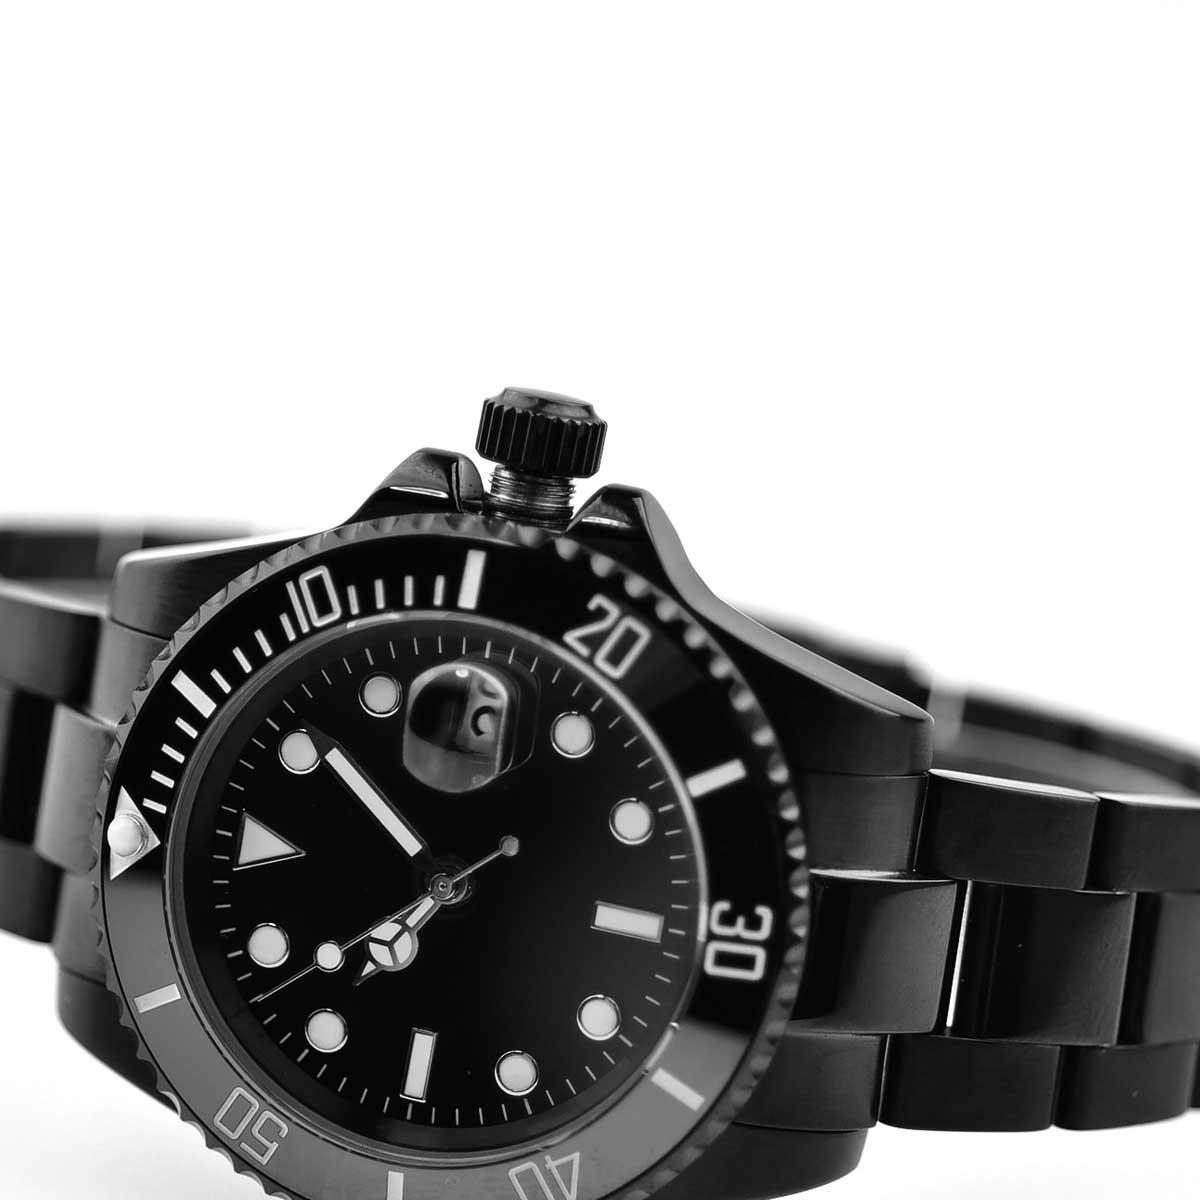 040d89587c NOLOGO ノーロゴ 機械式腕時計 自動巻 オートマチック サブマリーナ ブラック PVD [ ] シンプル メンズ NL-010BB3AS-メンズ腕時計  - guiadenegociosveaki.com.ve